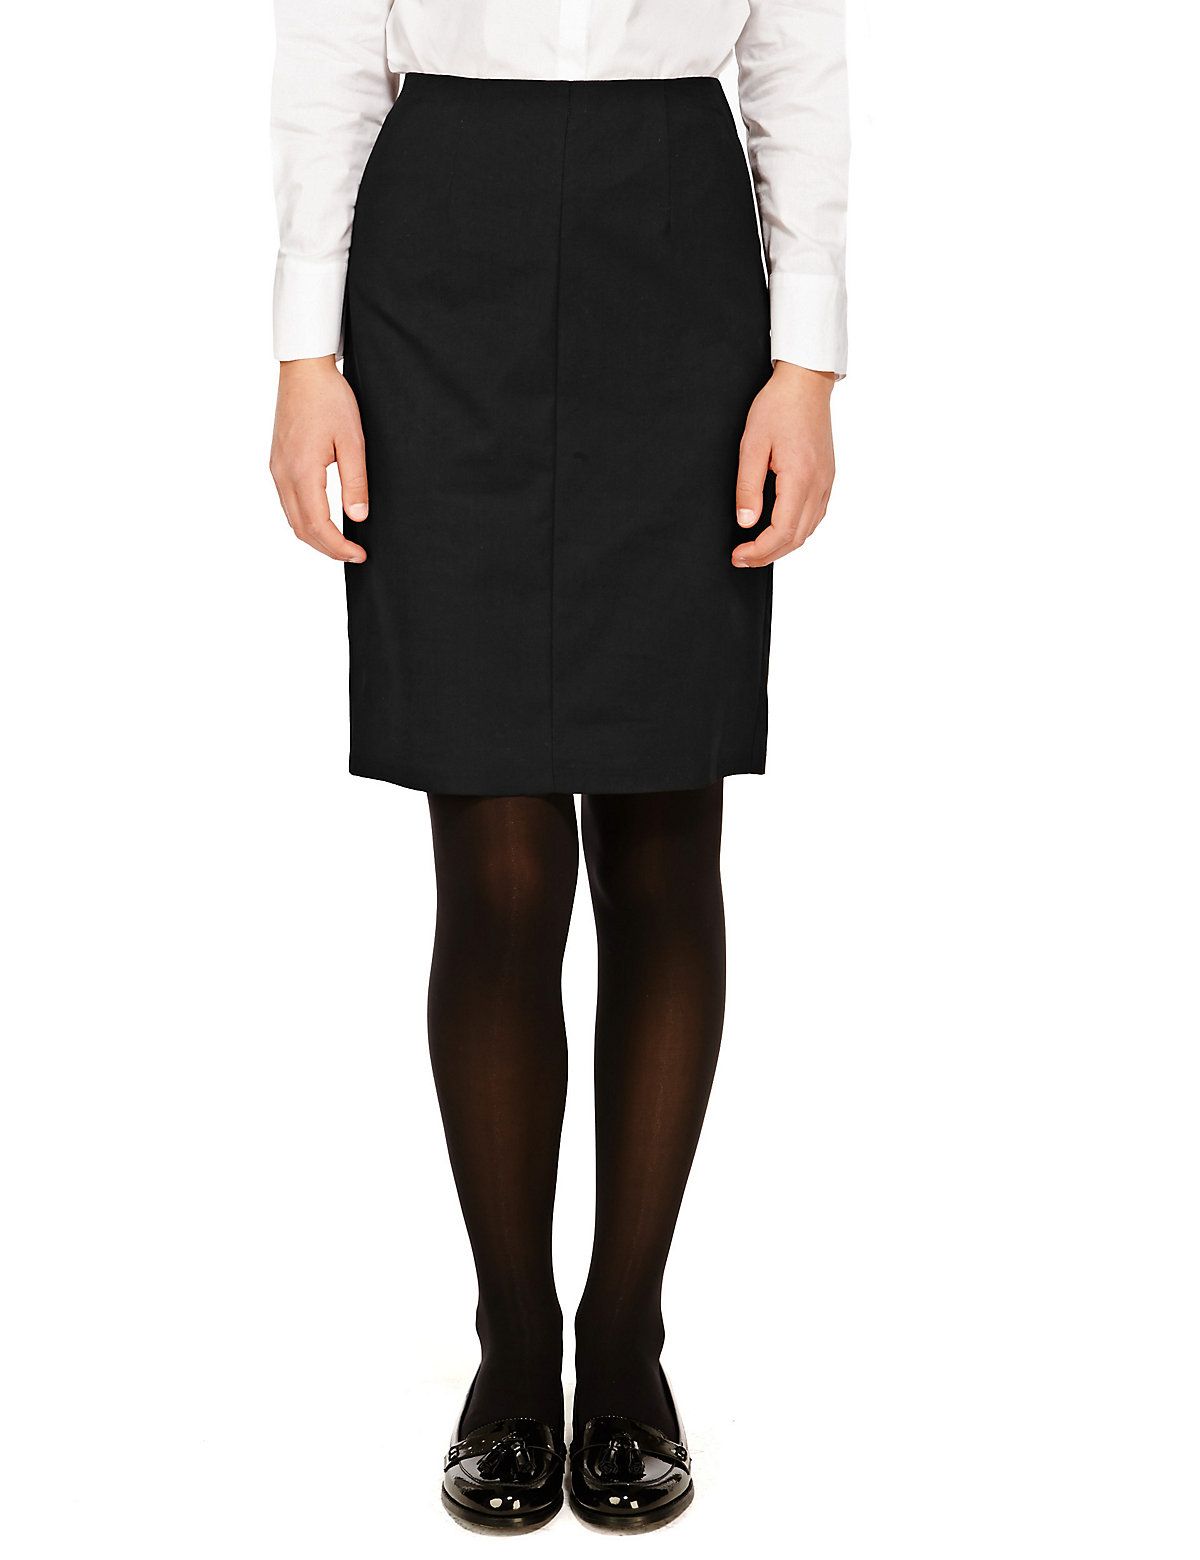 Senior Girls' Crease Resistant Pencil Skirt with Triple Action Stormwear (Older Girls)